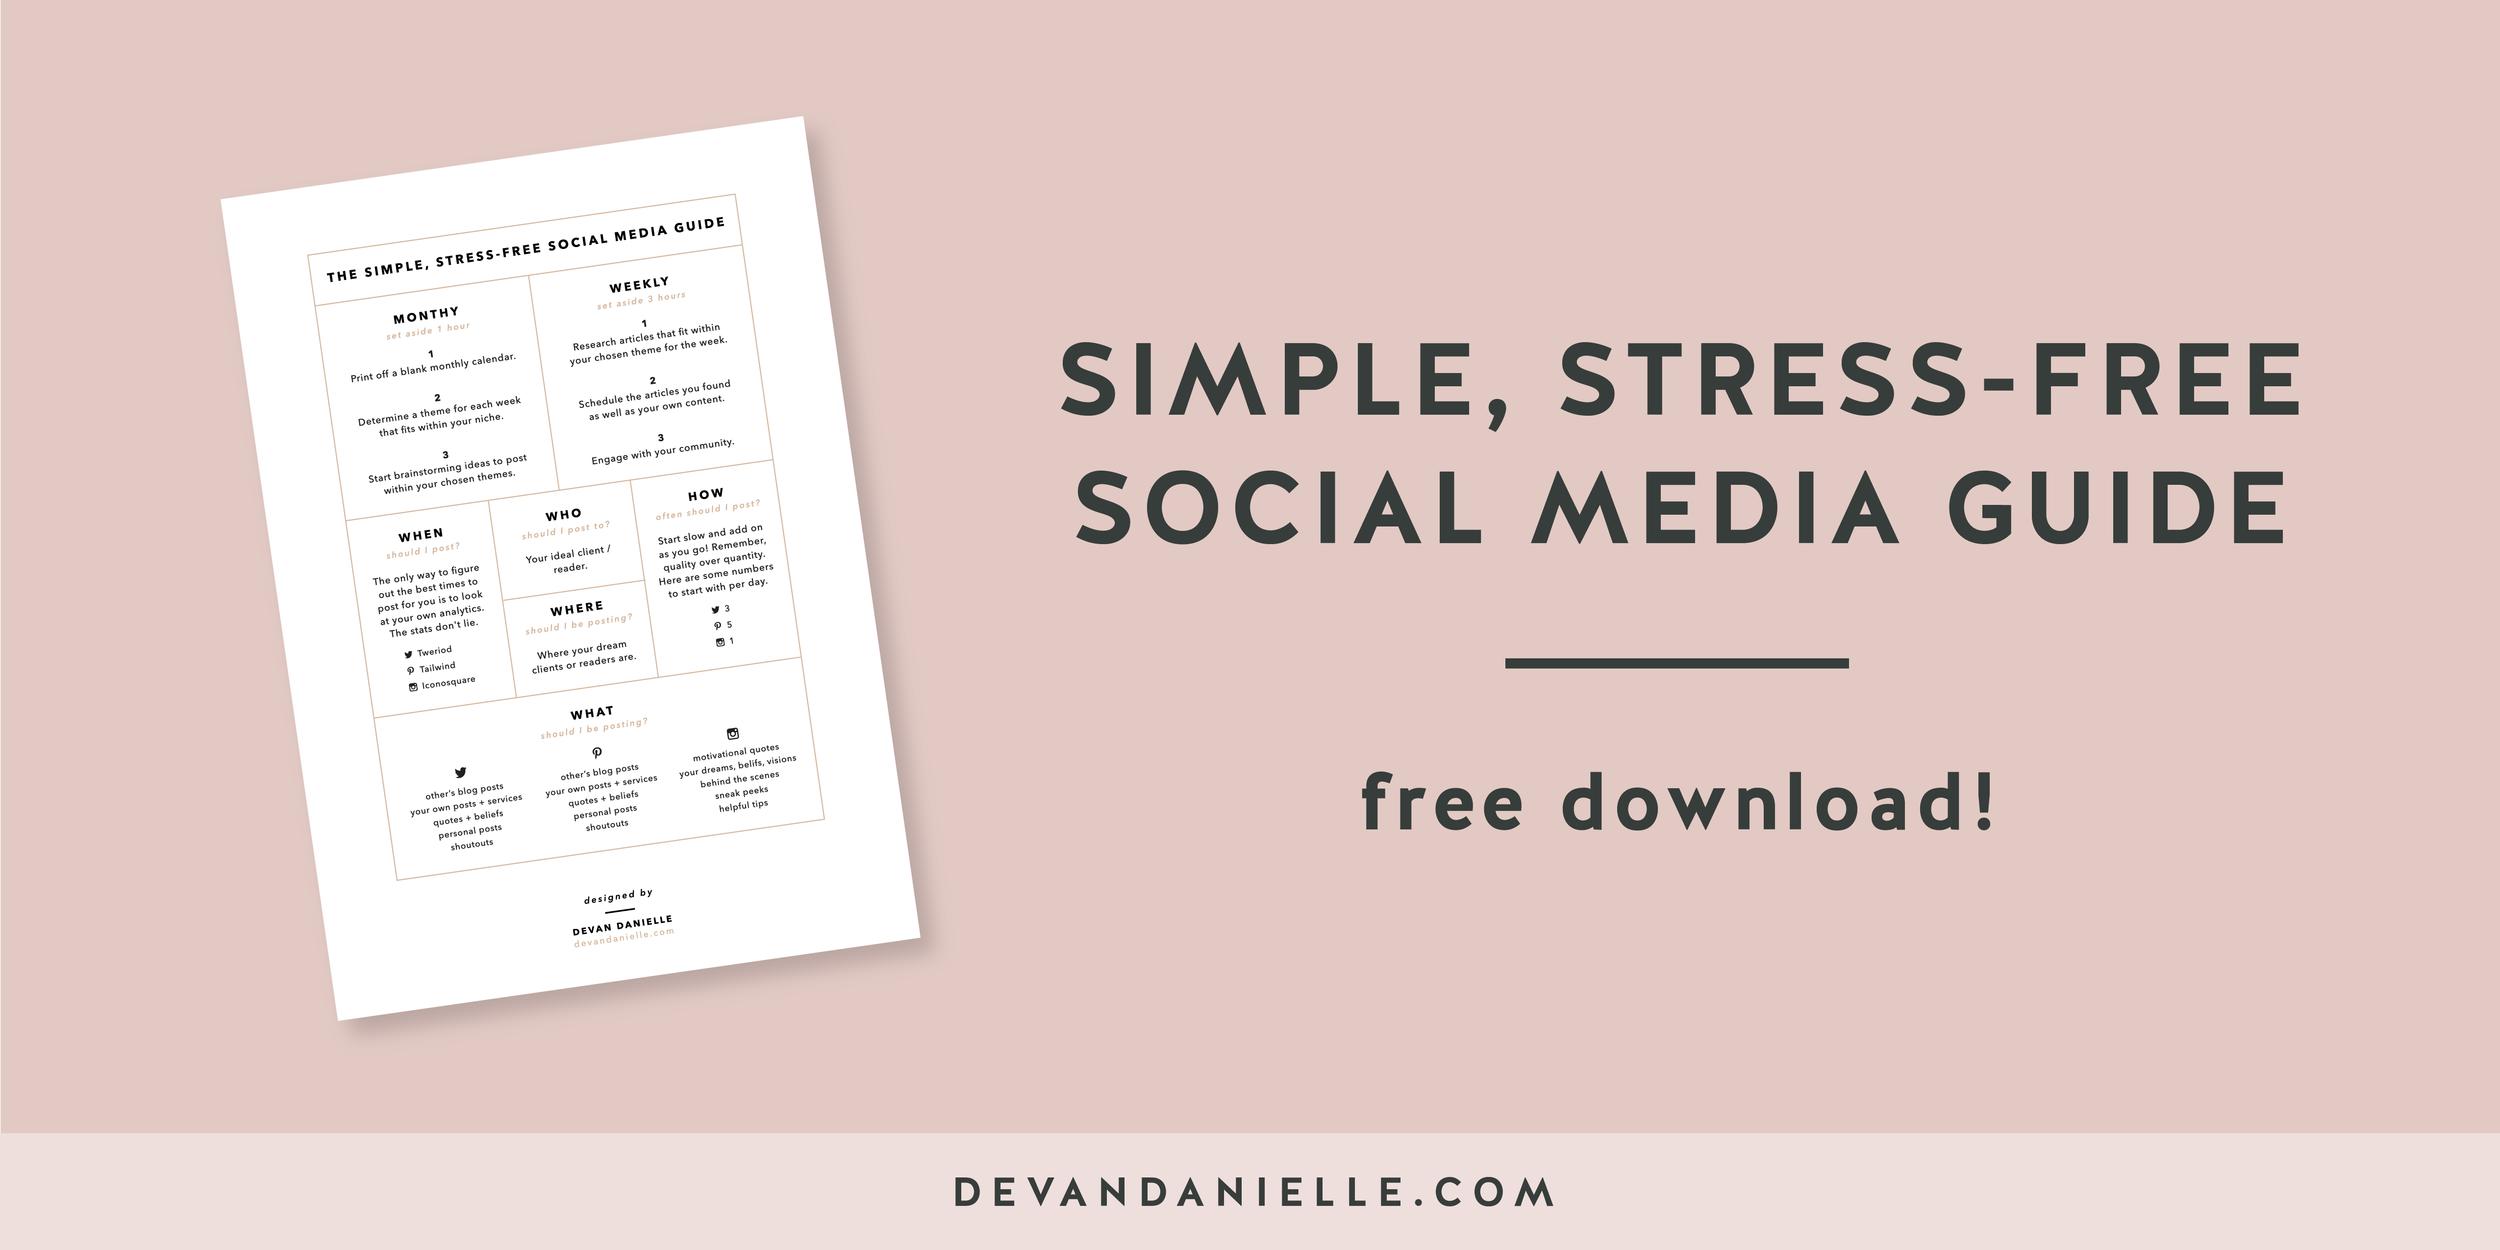 Simple Stress-free Social Media Guide